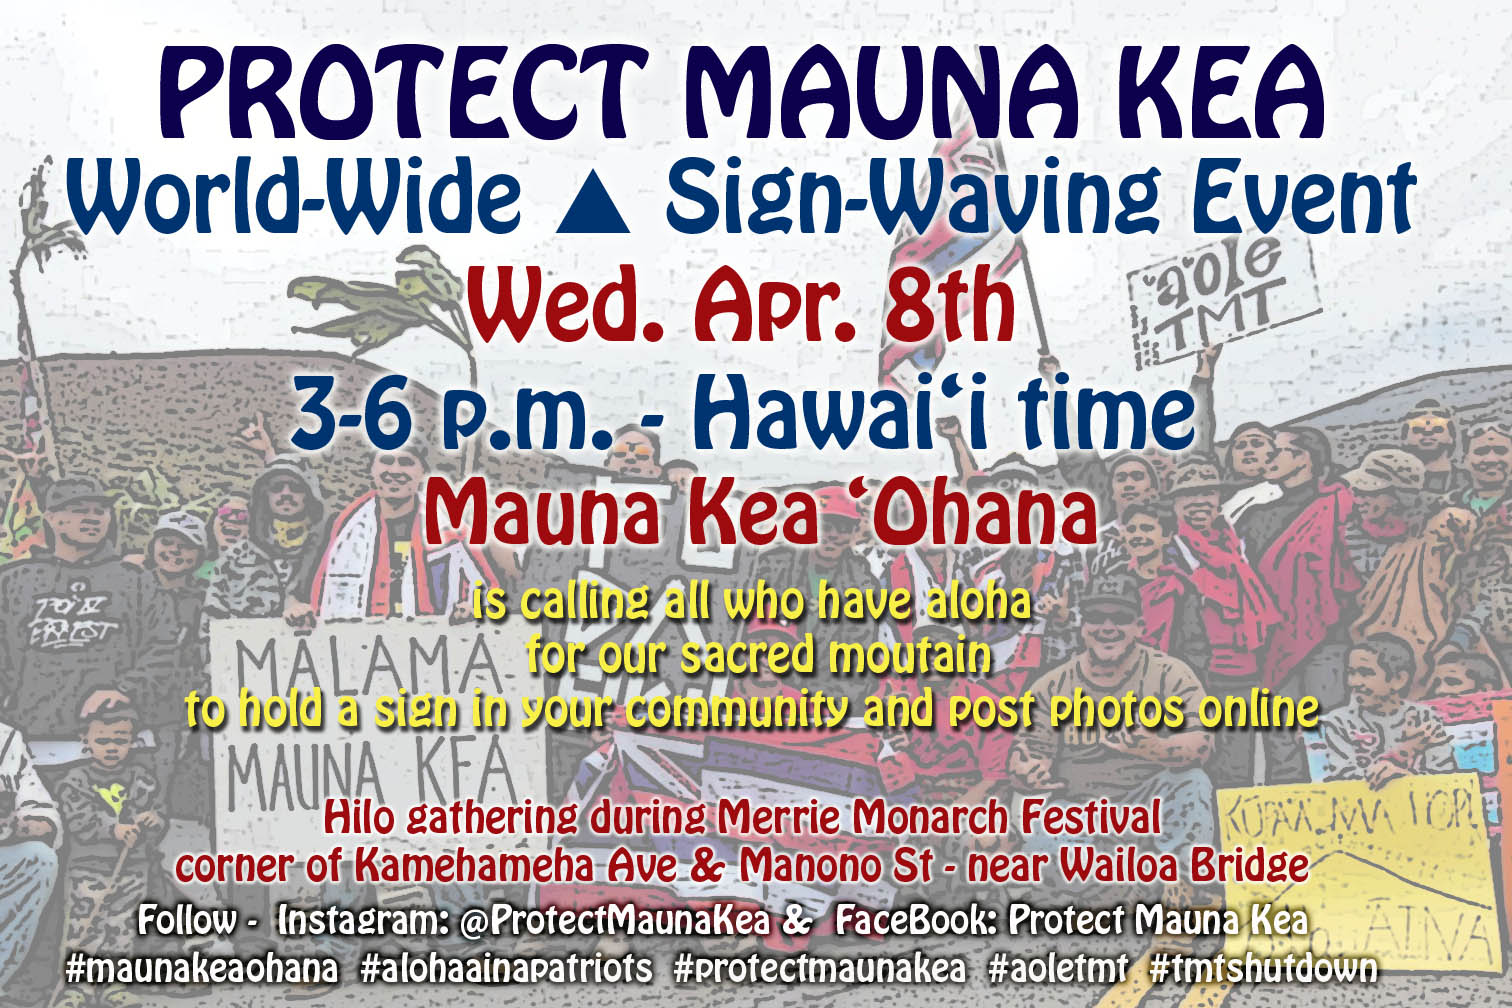 Protect Mauna Kea 4-8-15.jpg